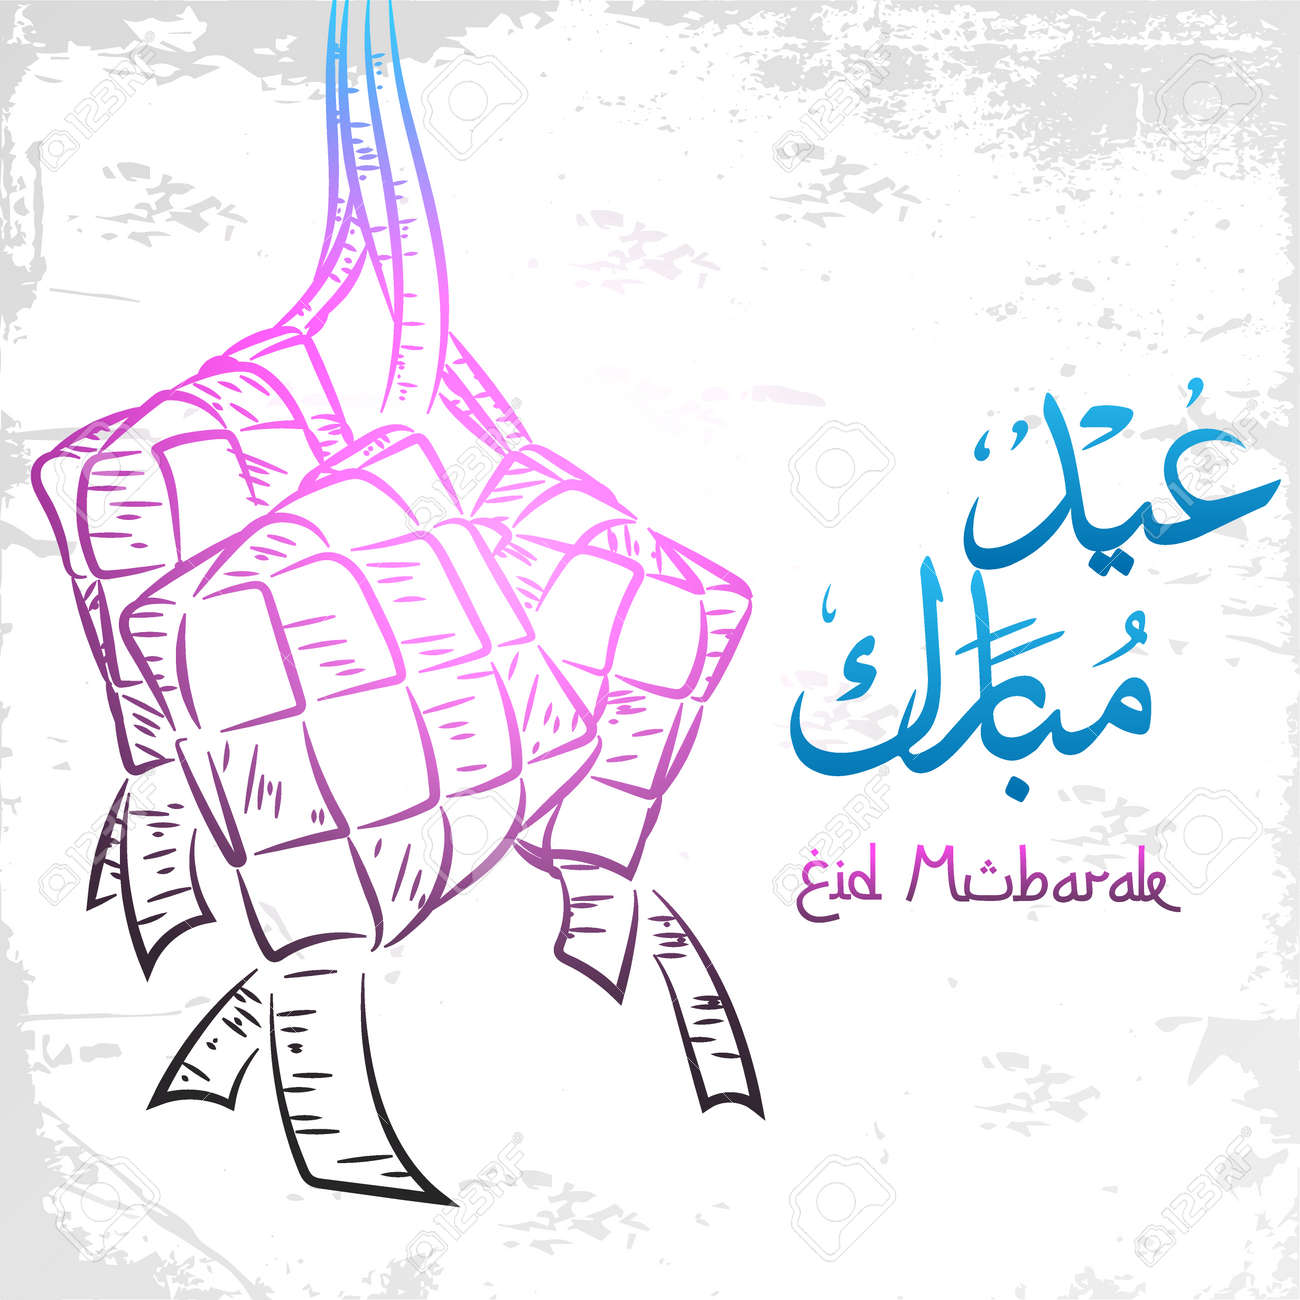 Eid mubarak greeting card on doodle style - 168266867